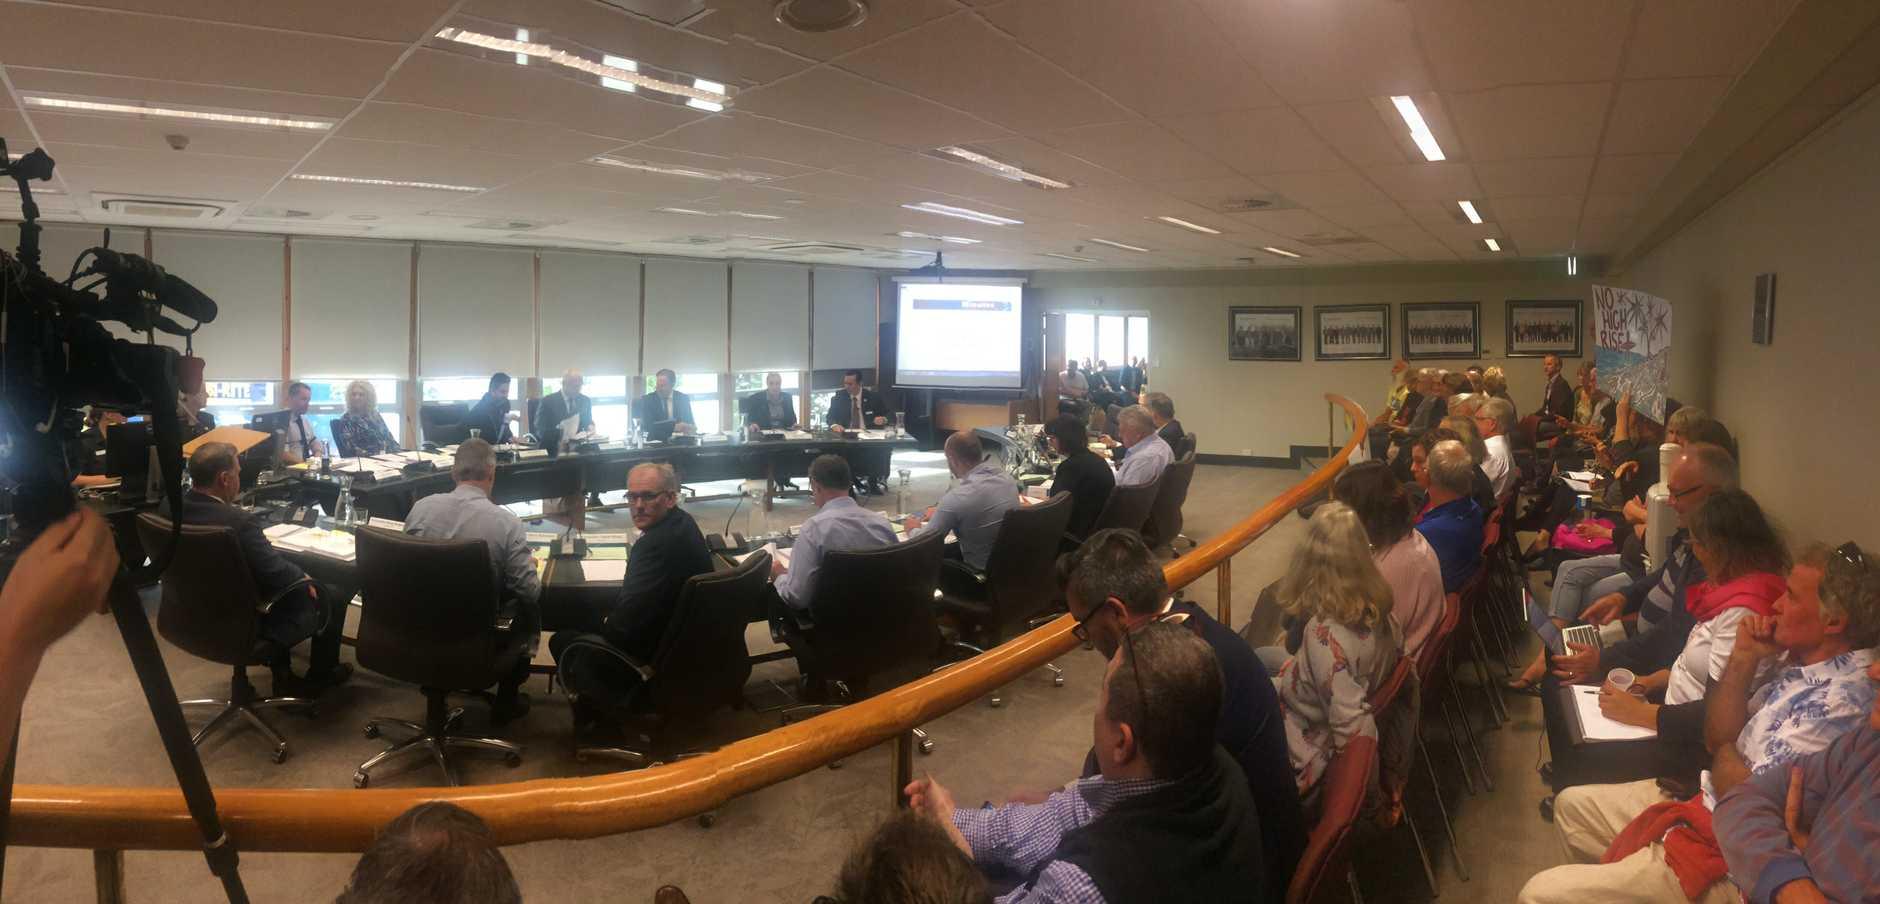 Sekisui meeting begins at Sunshine Coast Council Nambour chambers